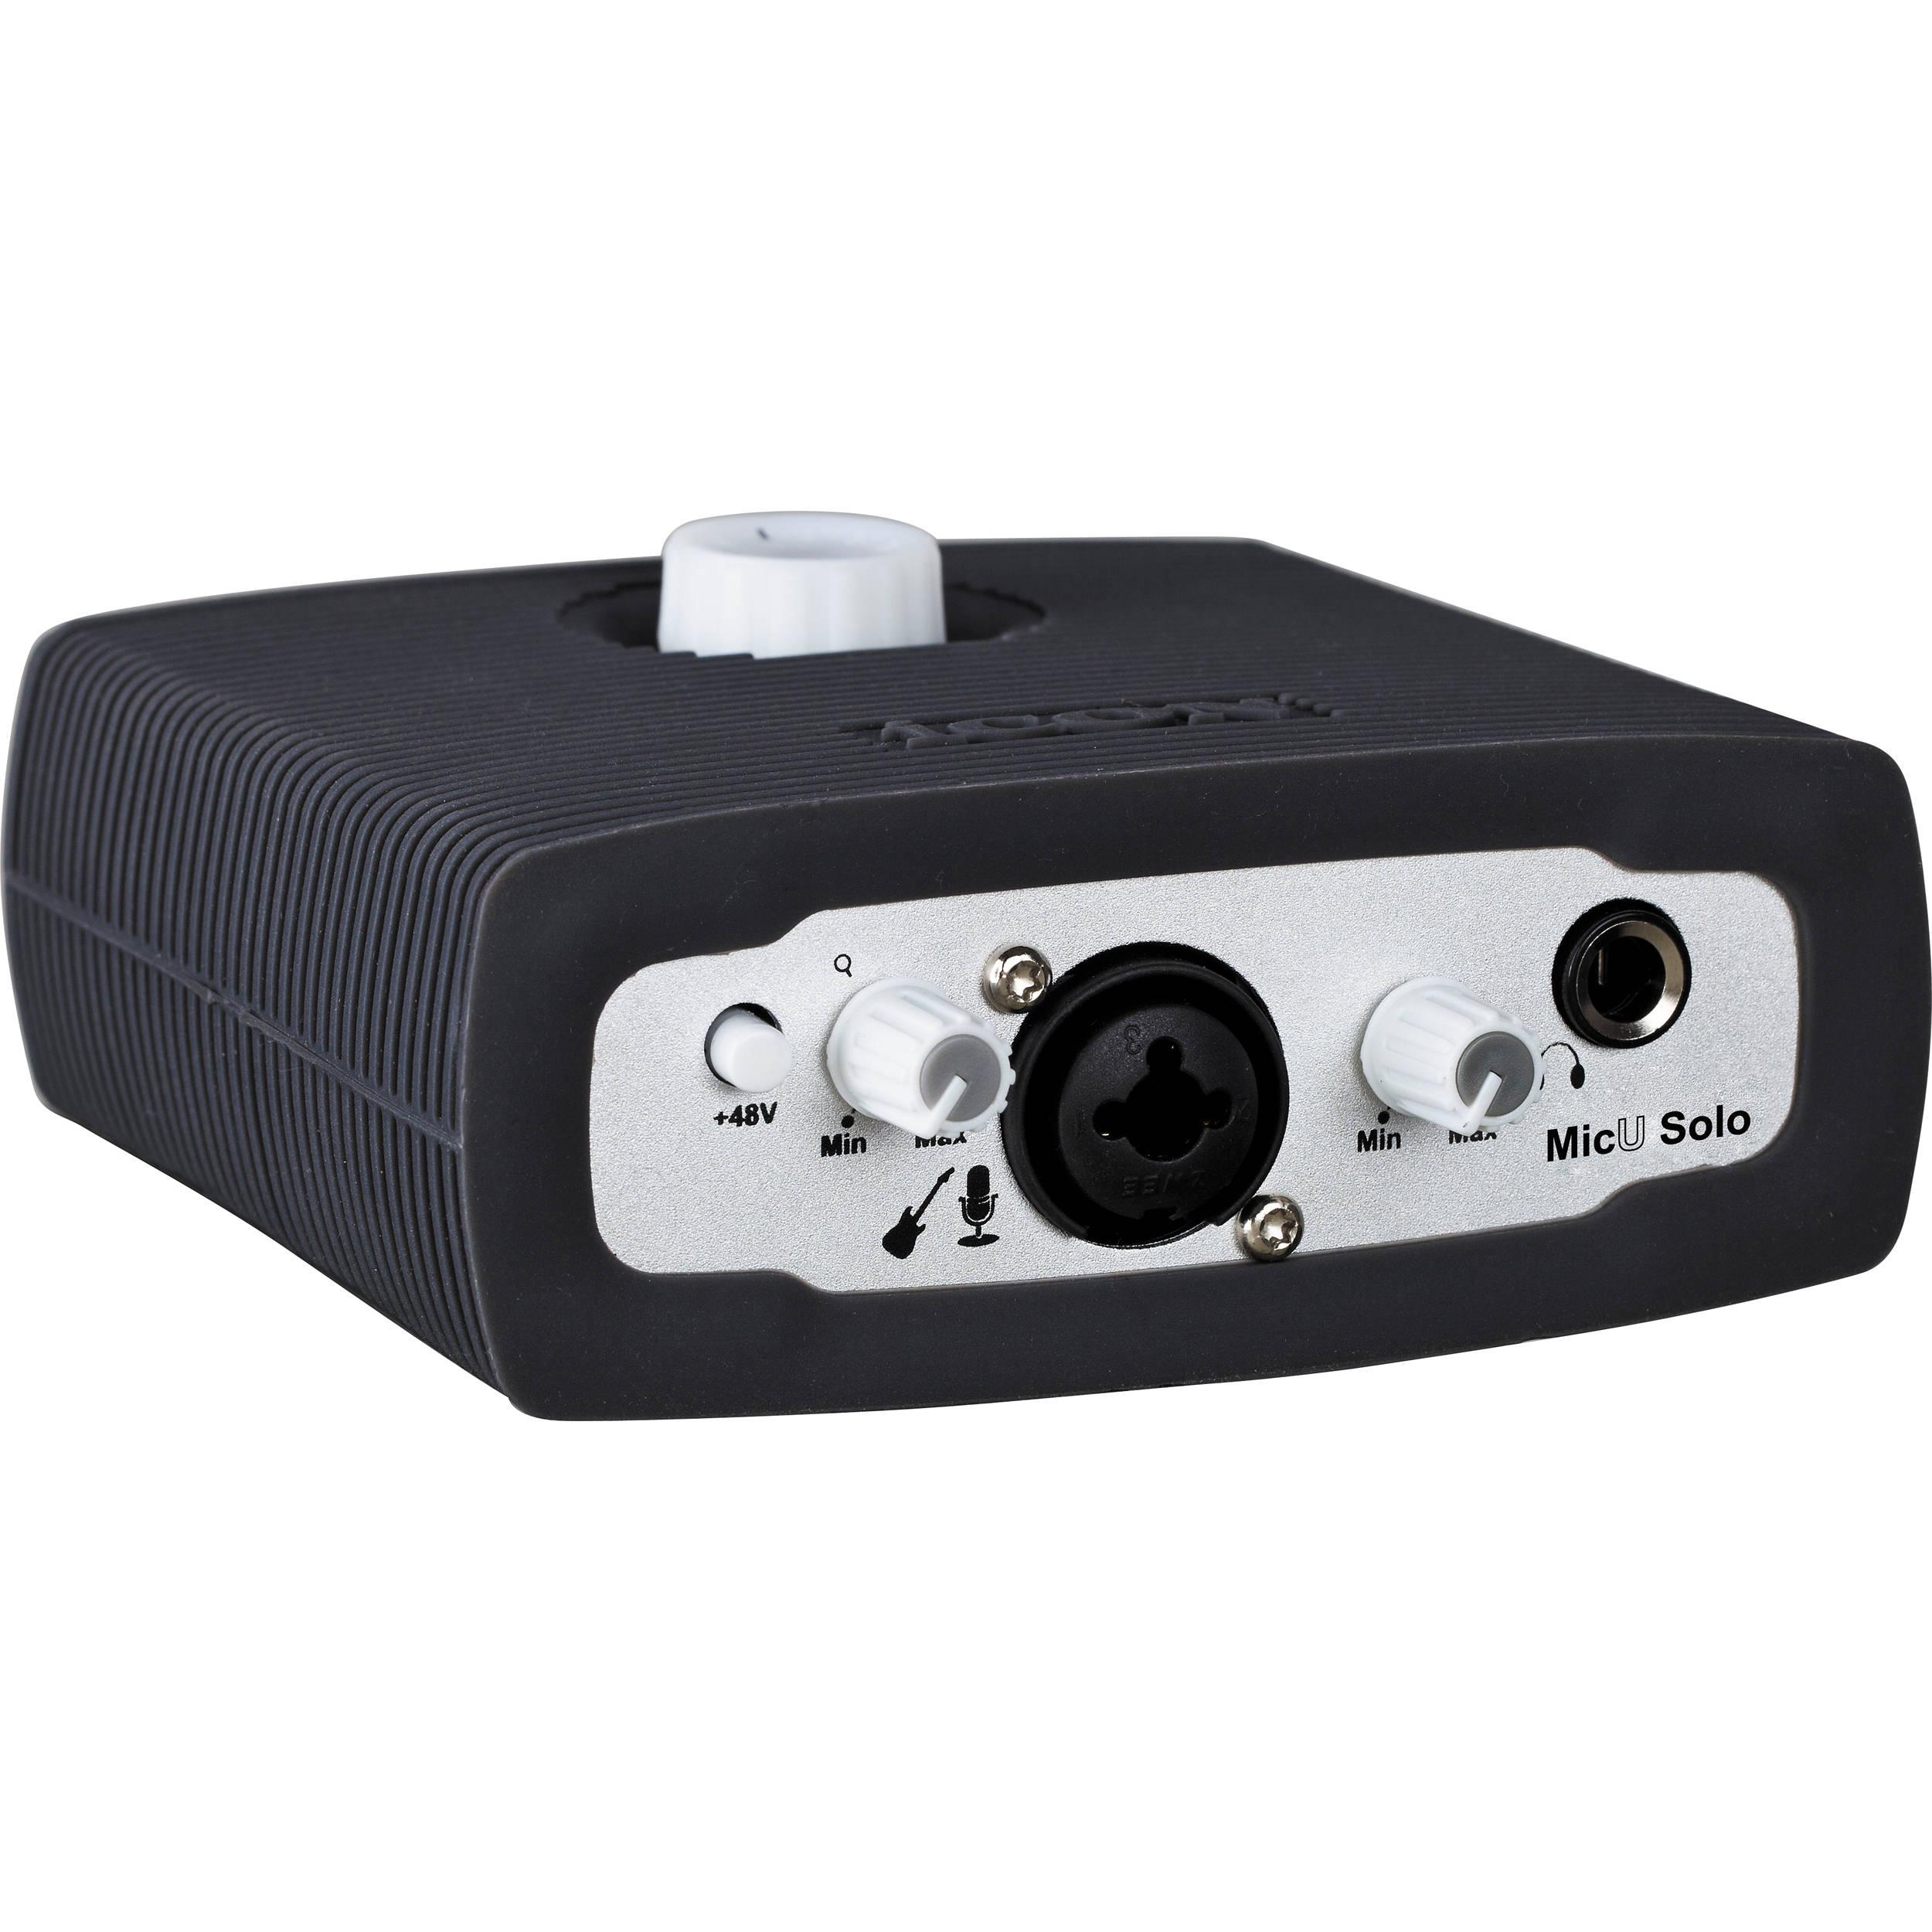 ICON Digital MicU Solo USB 2 0 Recording Audio Interface with Microphone/DI  Preamplifier